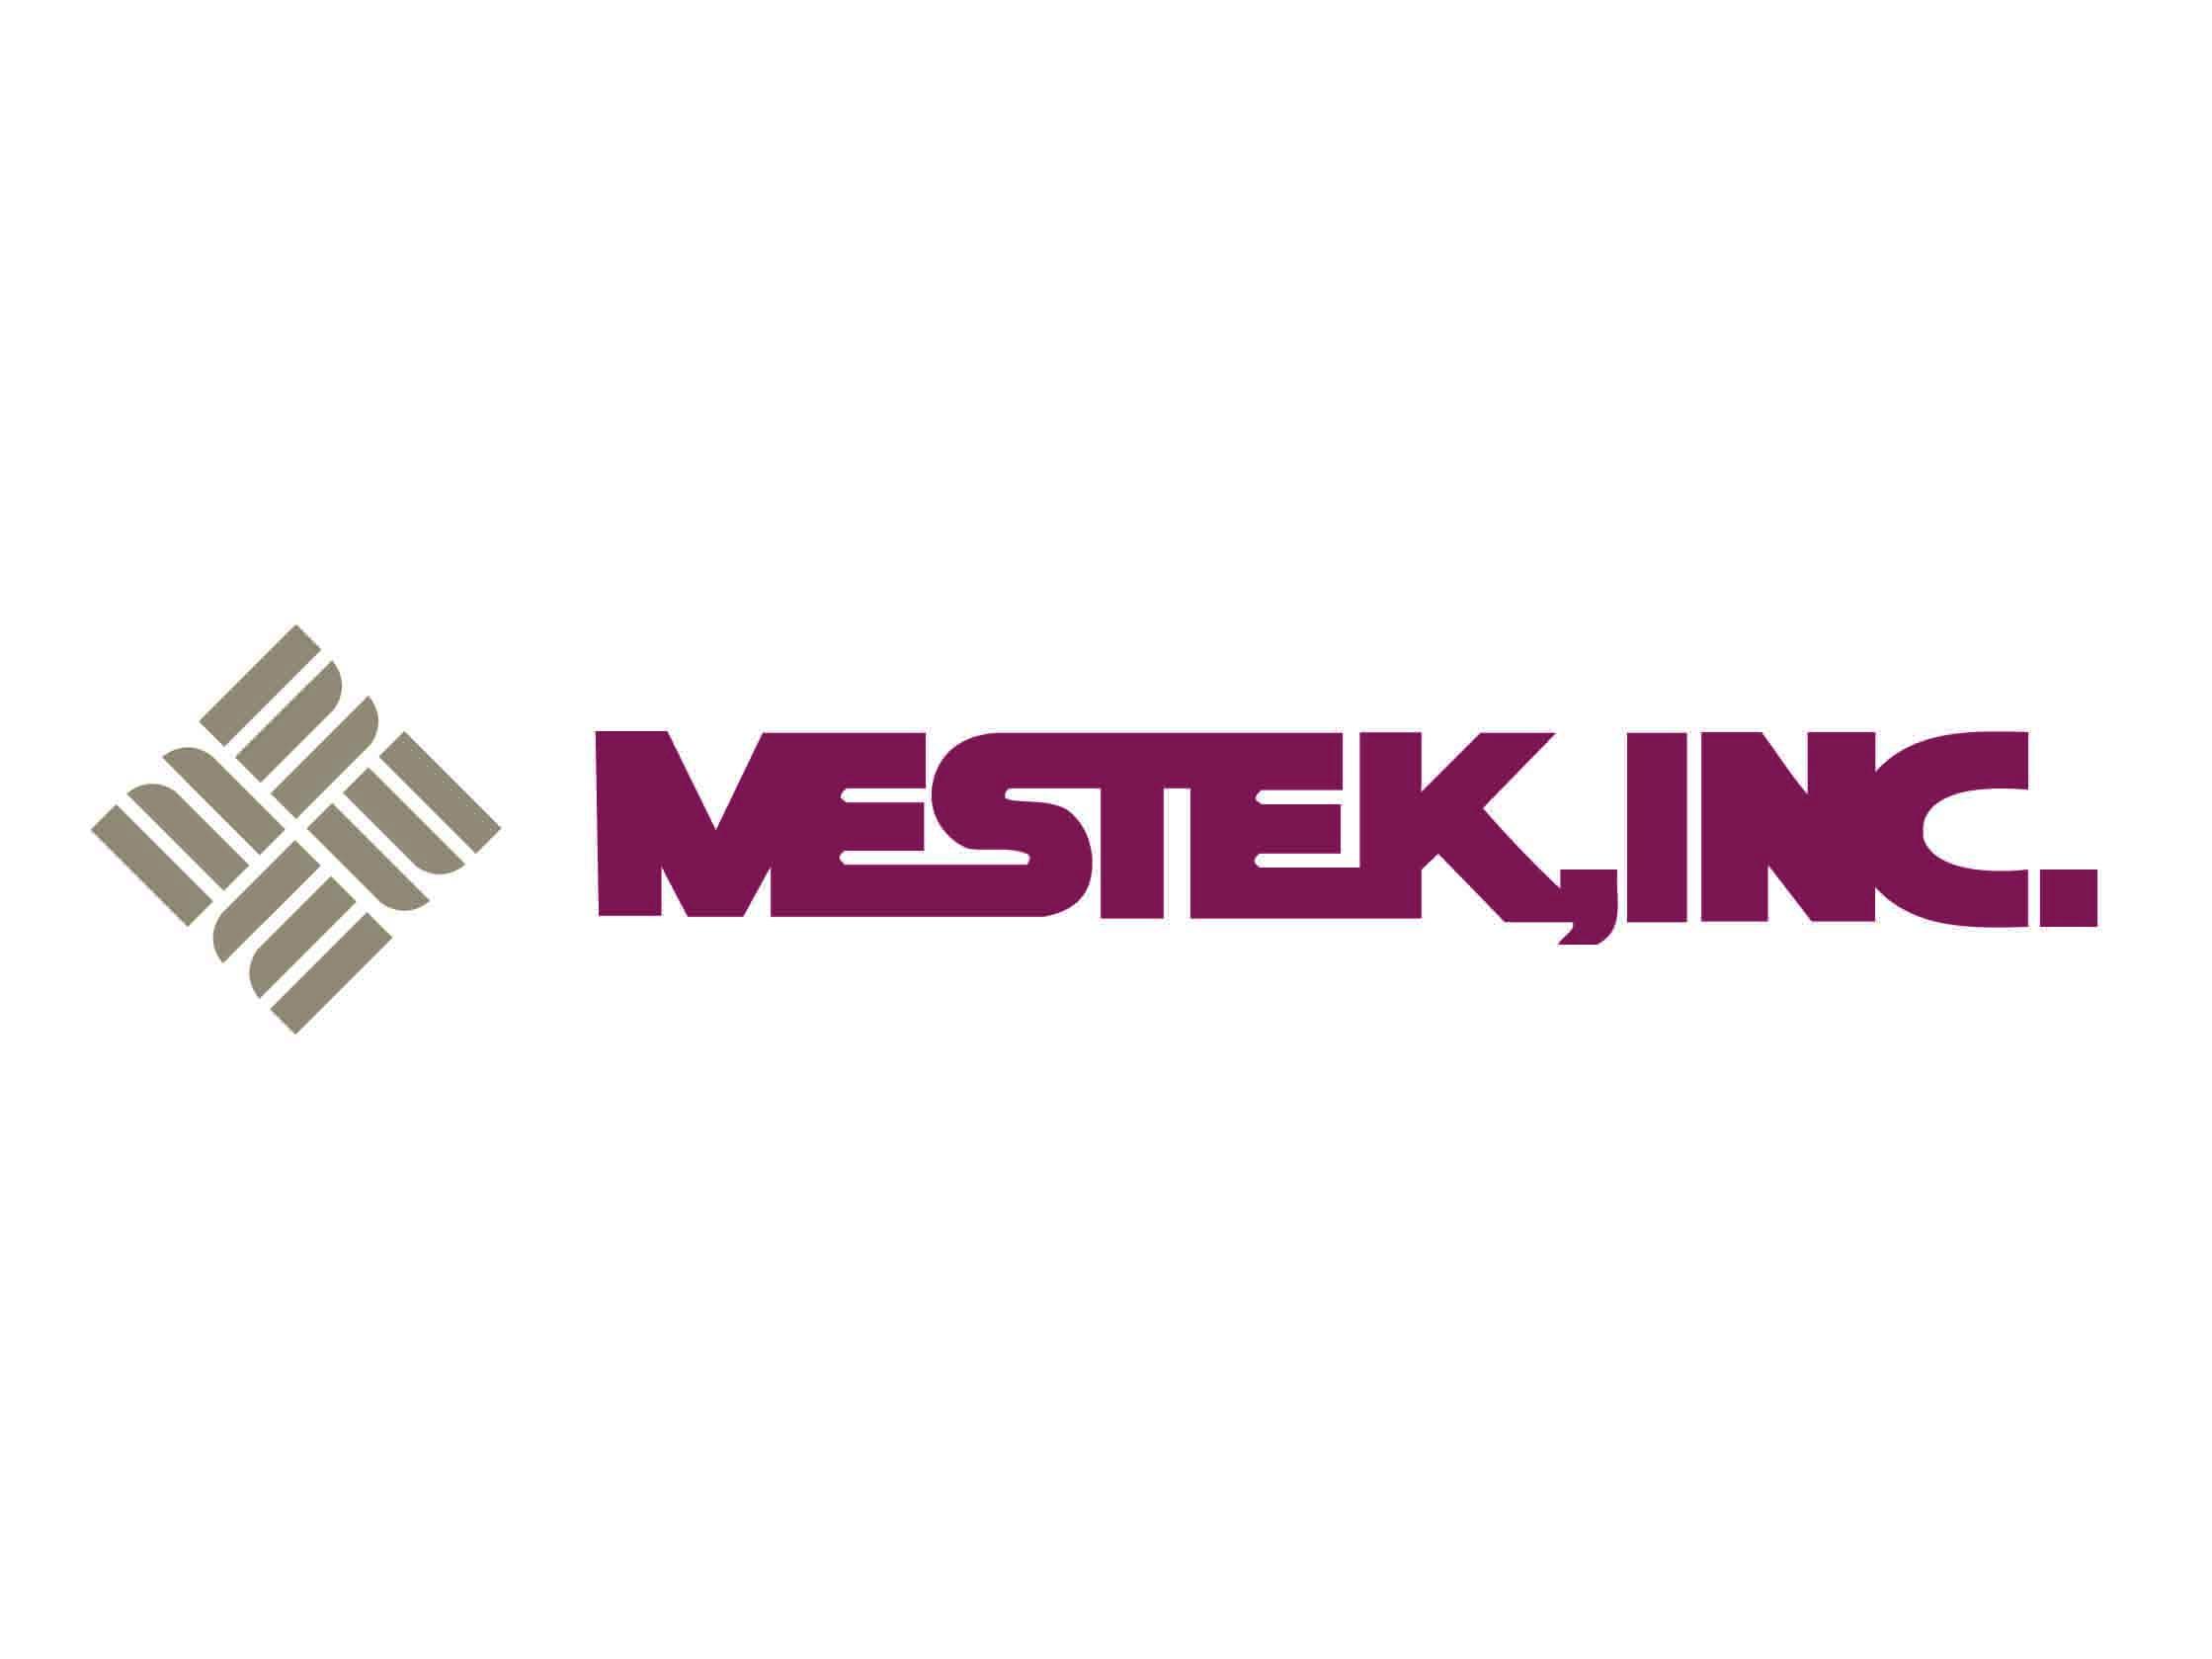 MESTEK Inc.jpg